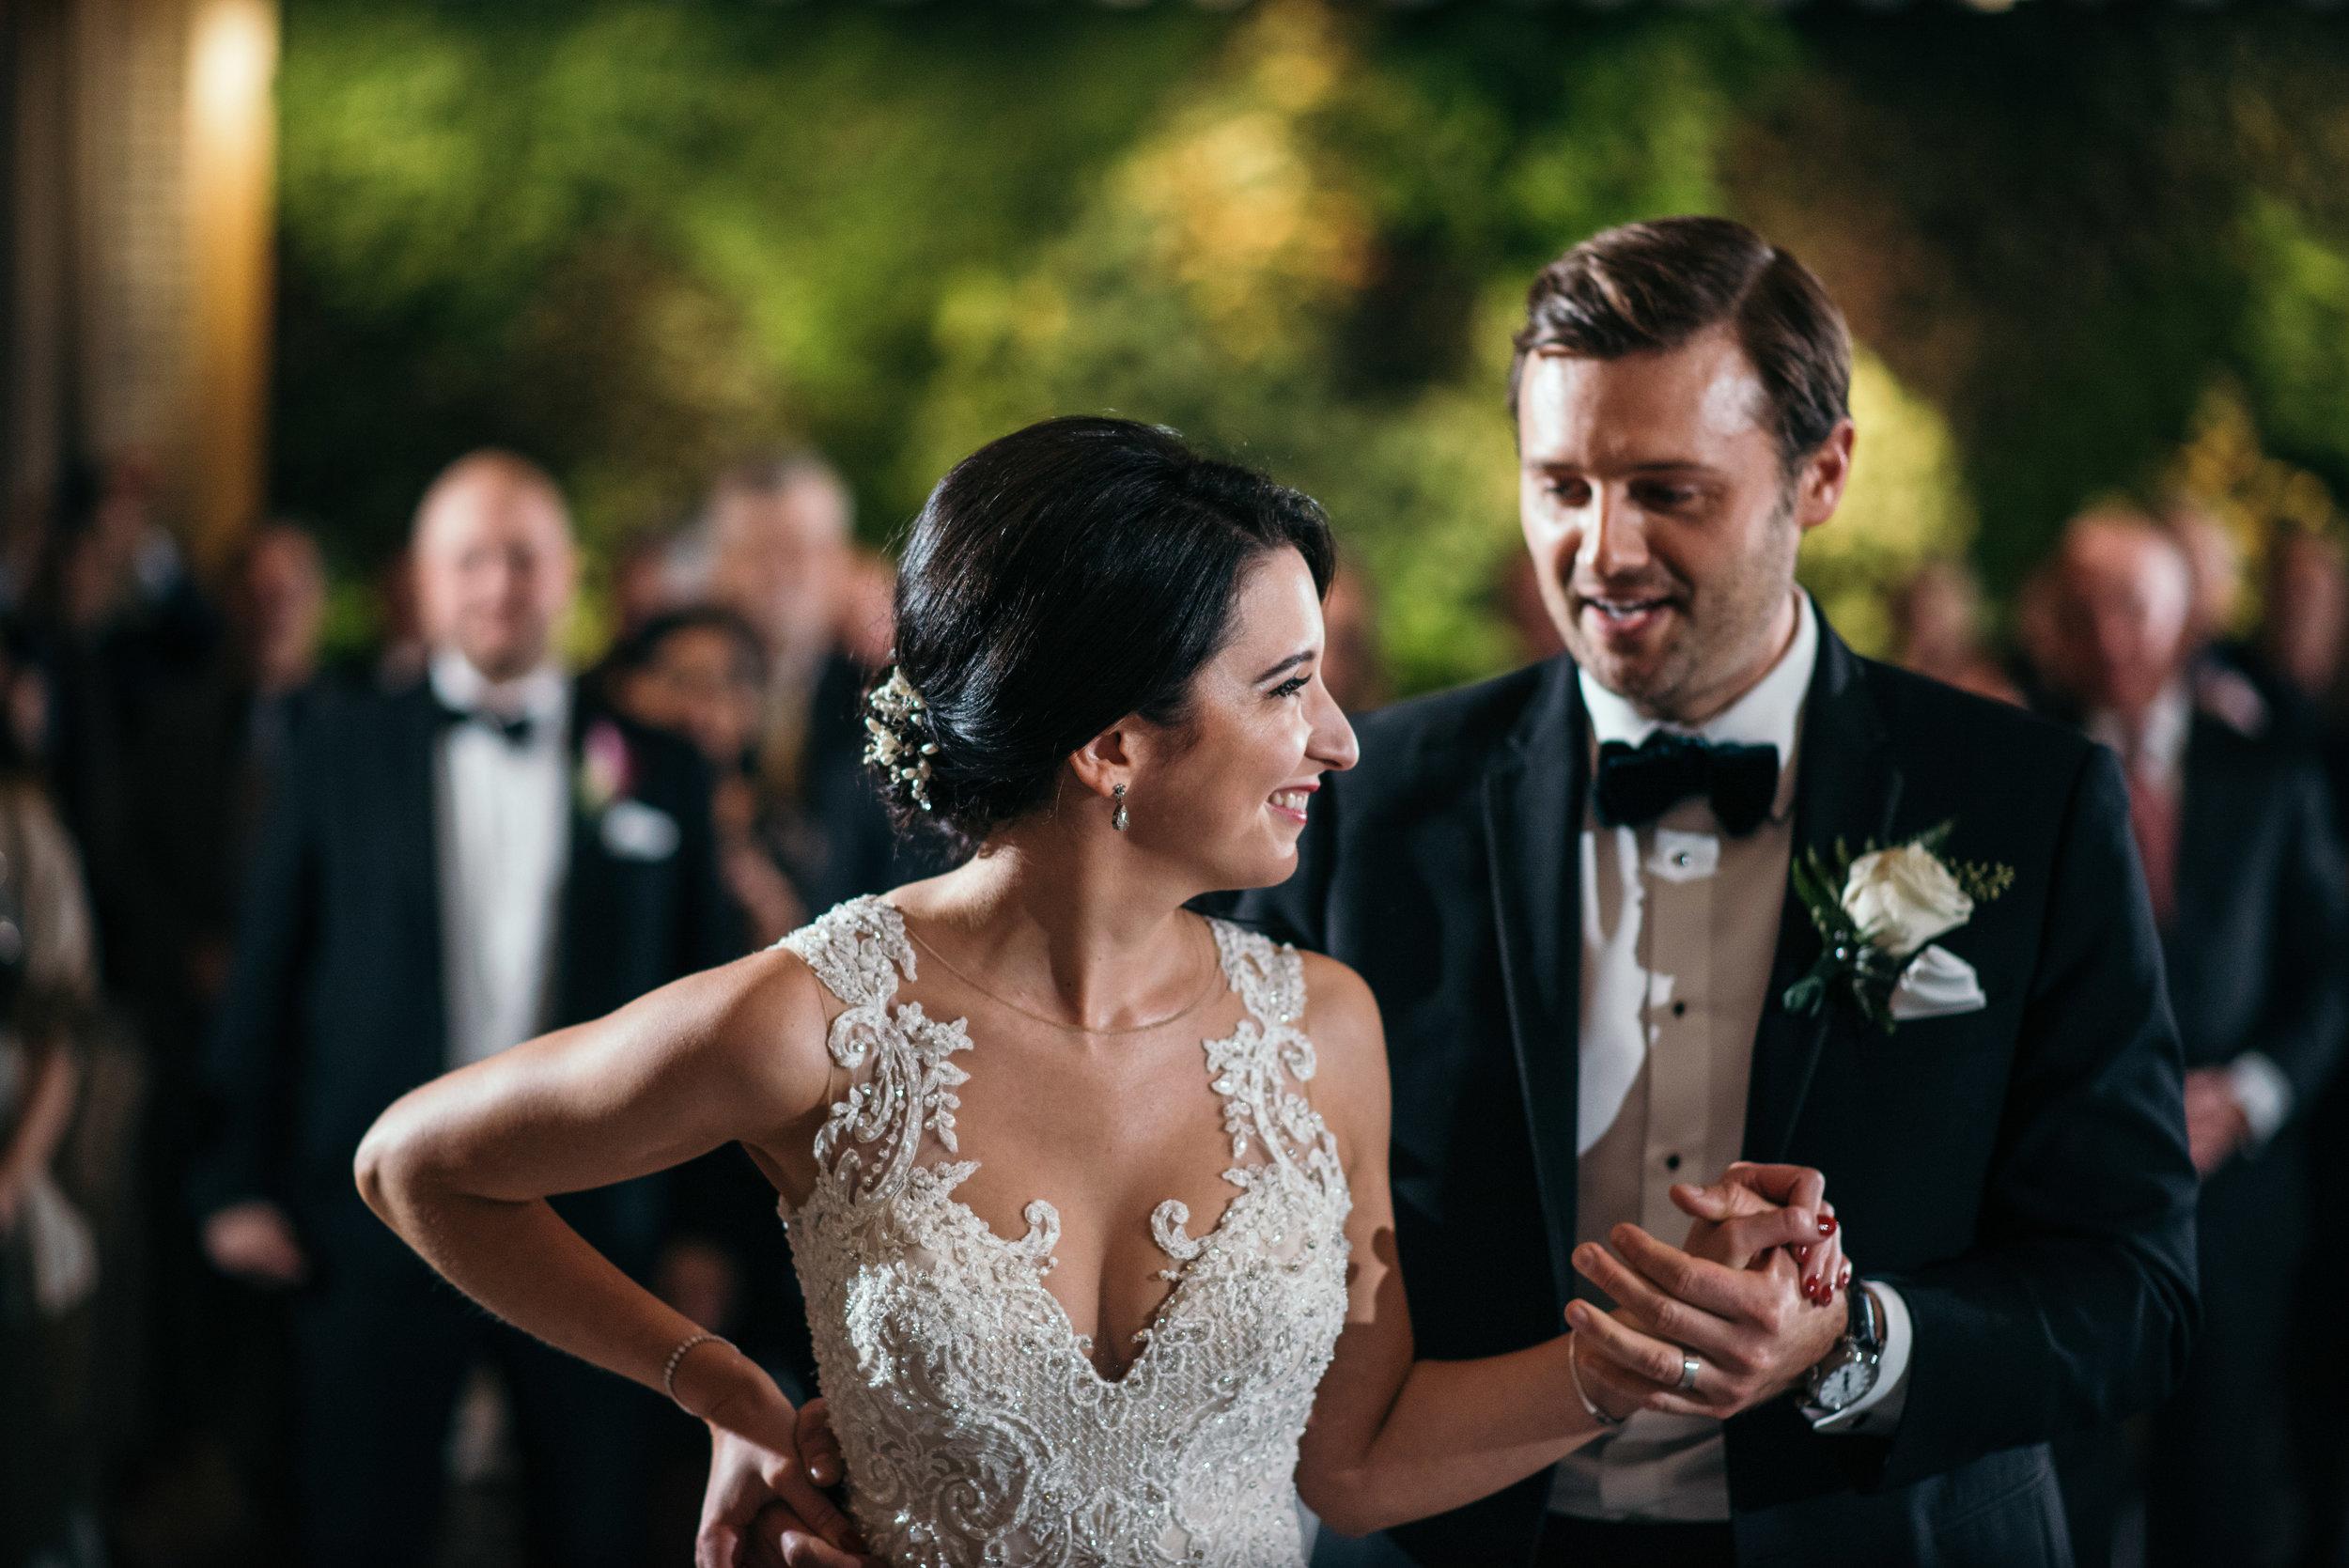 WeddingPhotos | NJPhotographer | Highlights-16-10.jpg